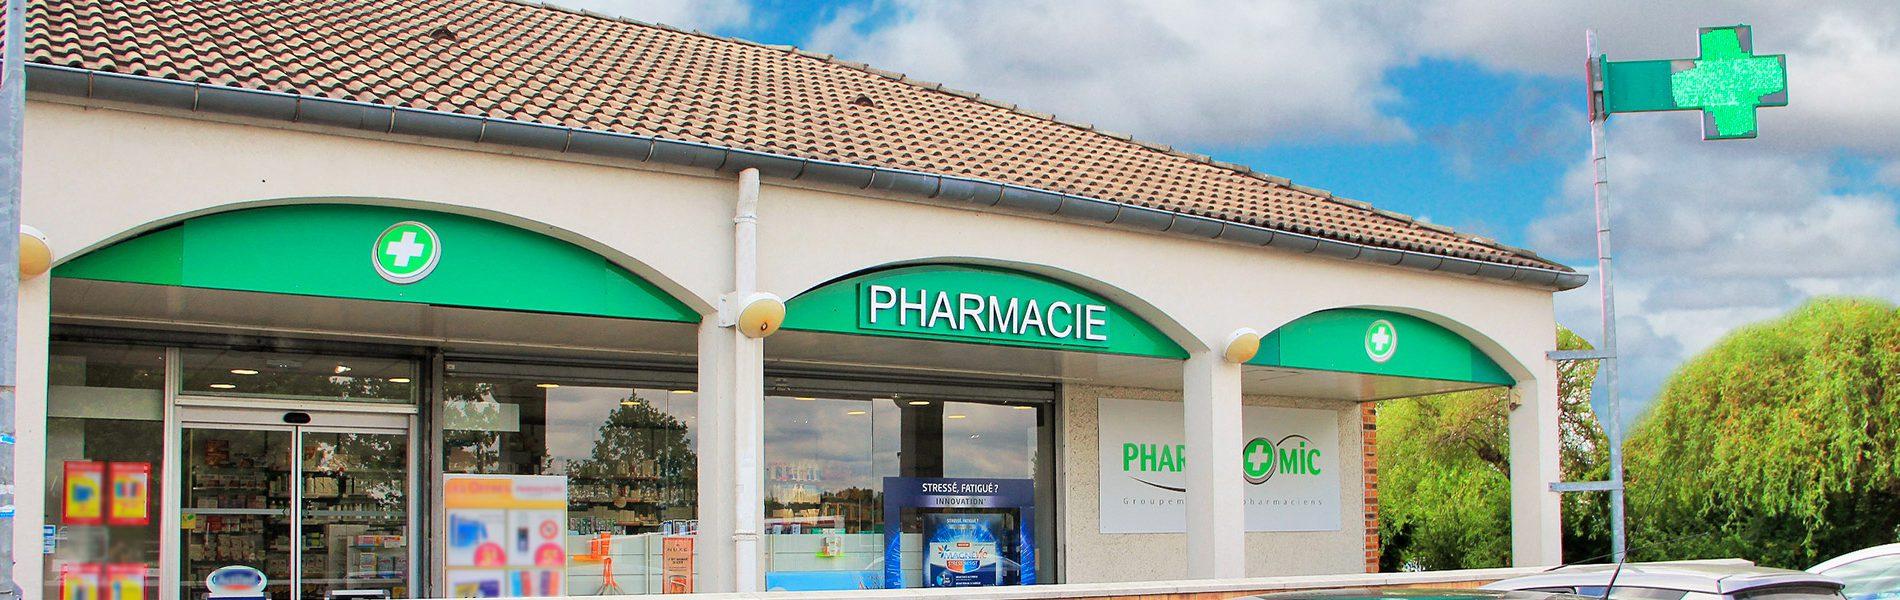 Pharmacie DES ARCADES - Image Homepage 2